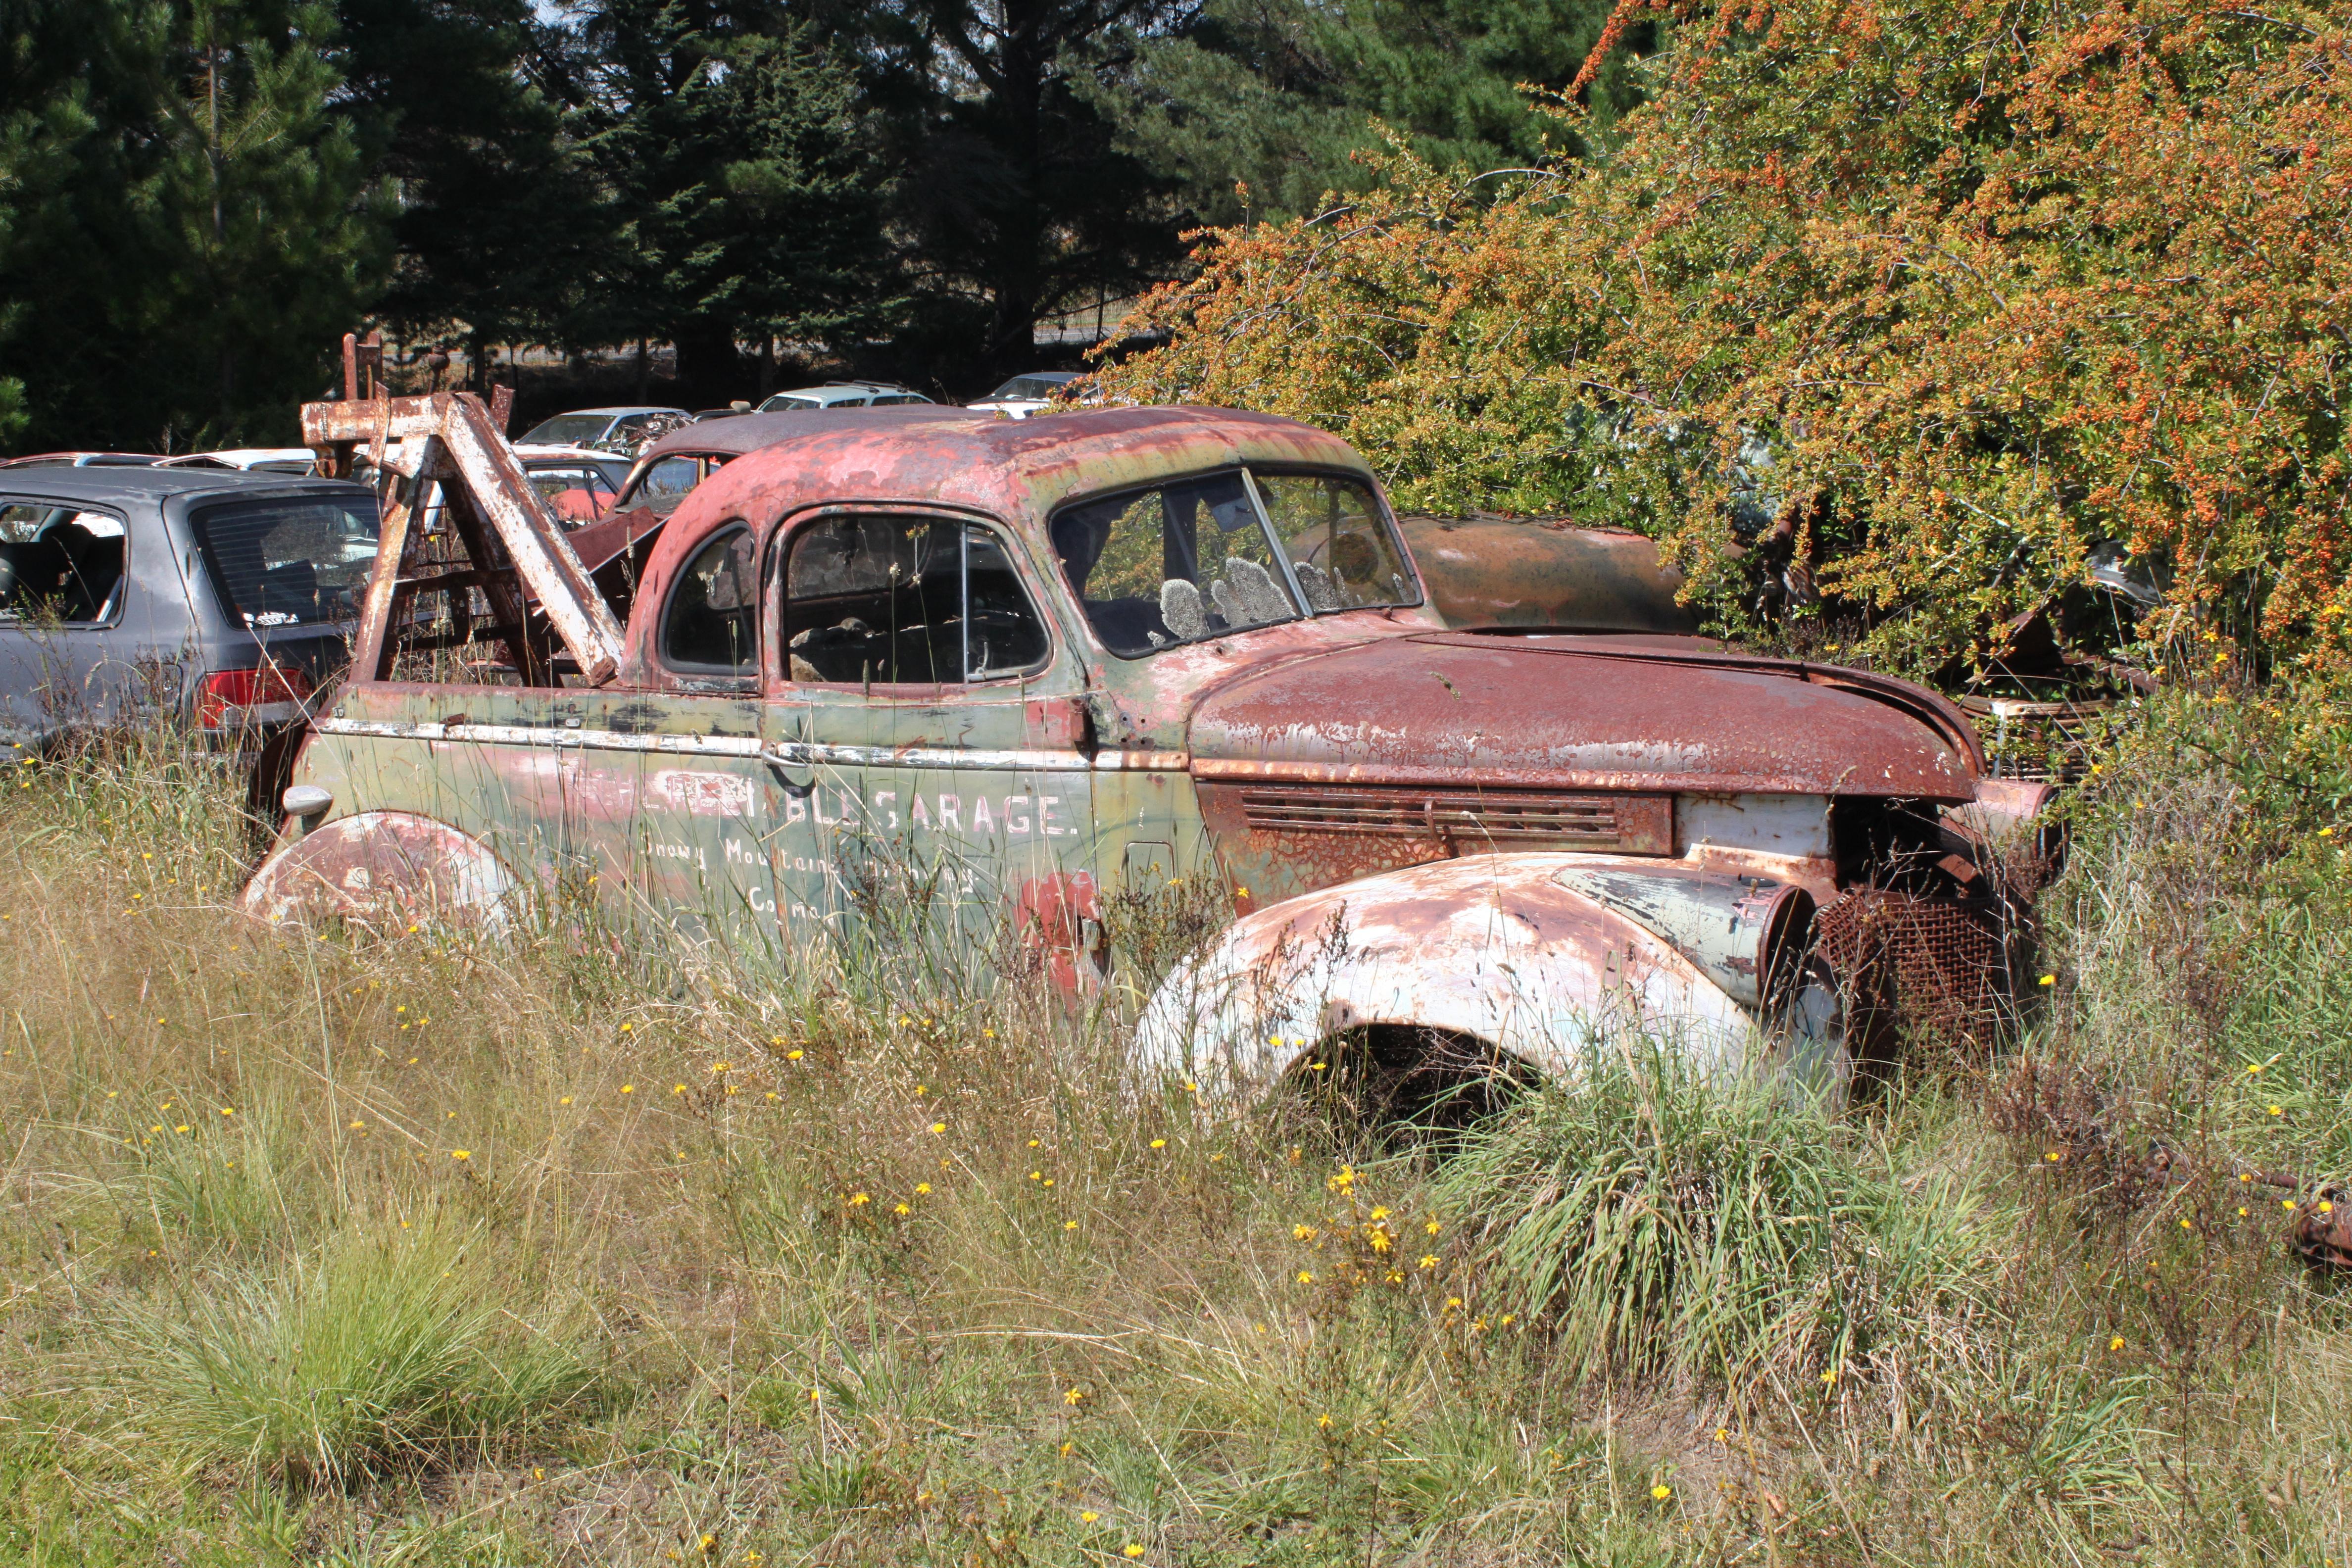 File:1946? Chevrolet Tow Truck (16281878664).jpg - Wikimedia Commons